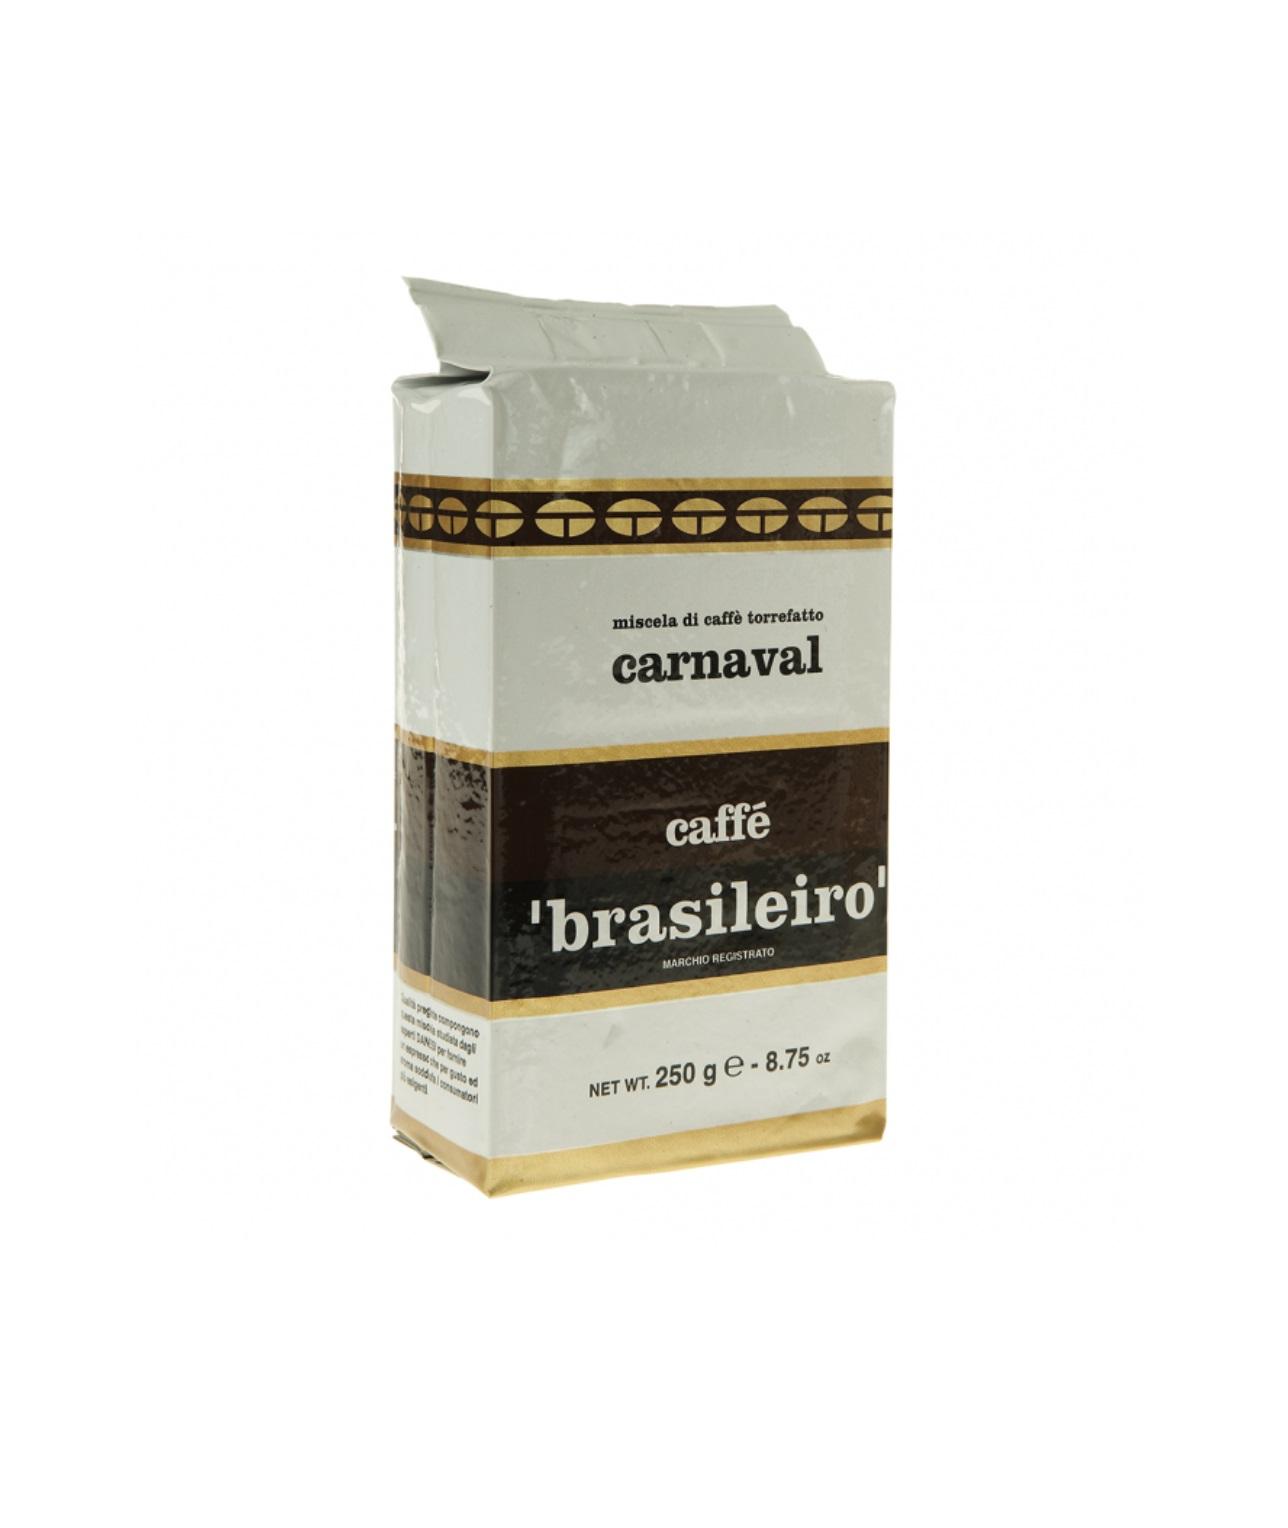 Онлайн каталог PROMENU: Кофе Brasileiro Carnaval Danesi, 0,25 кг, вакуумный пакет  2010340